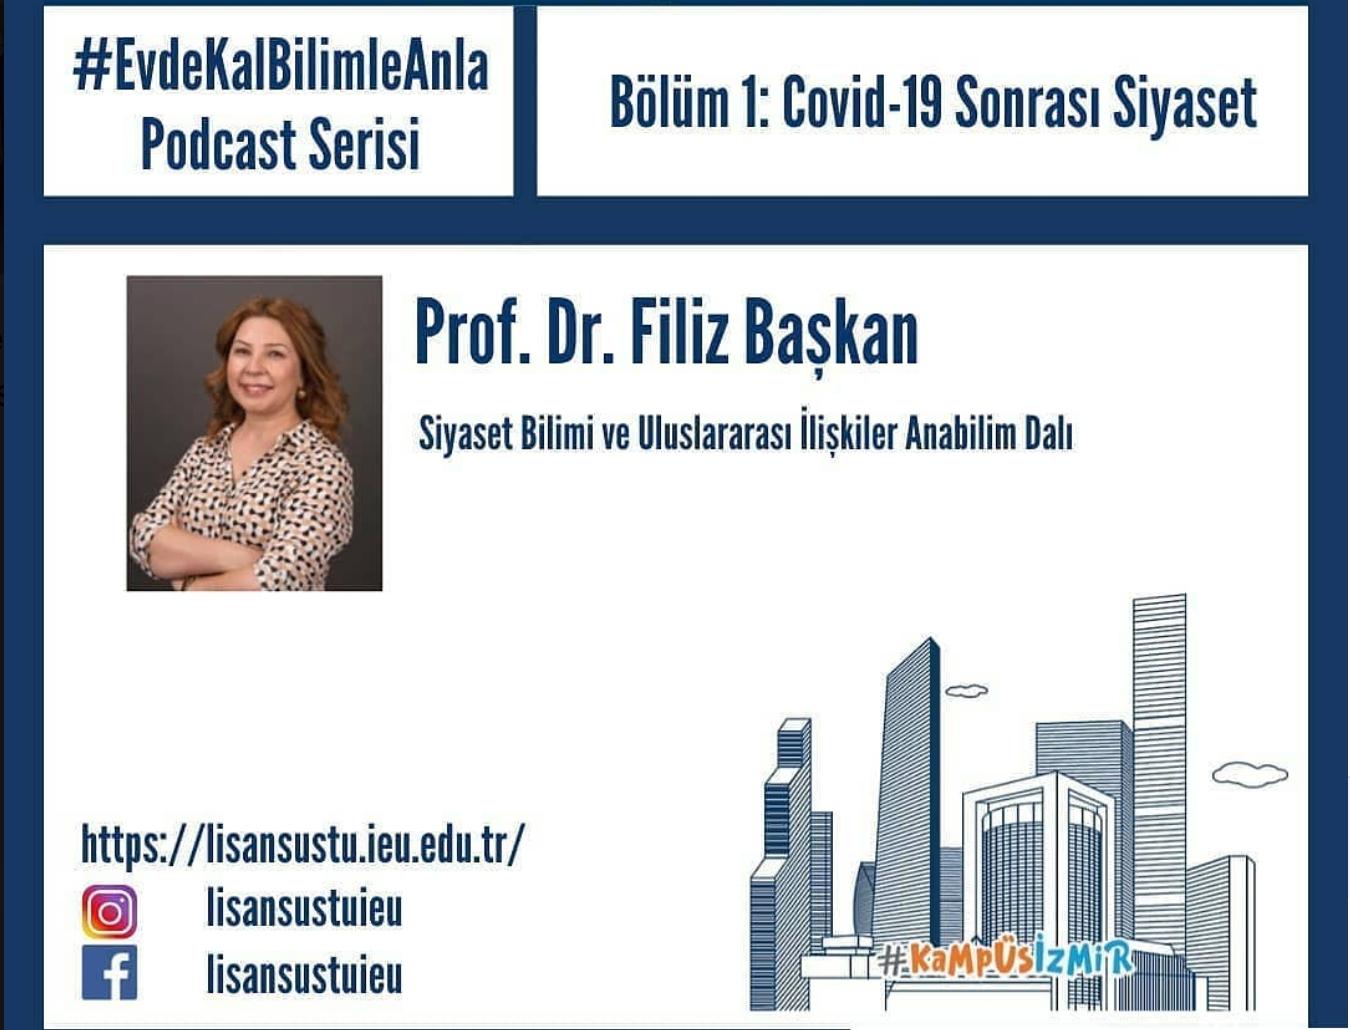 Filiz Başkan, 'Covid-19 Sonrası Siyaset'i anlattı